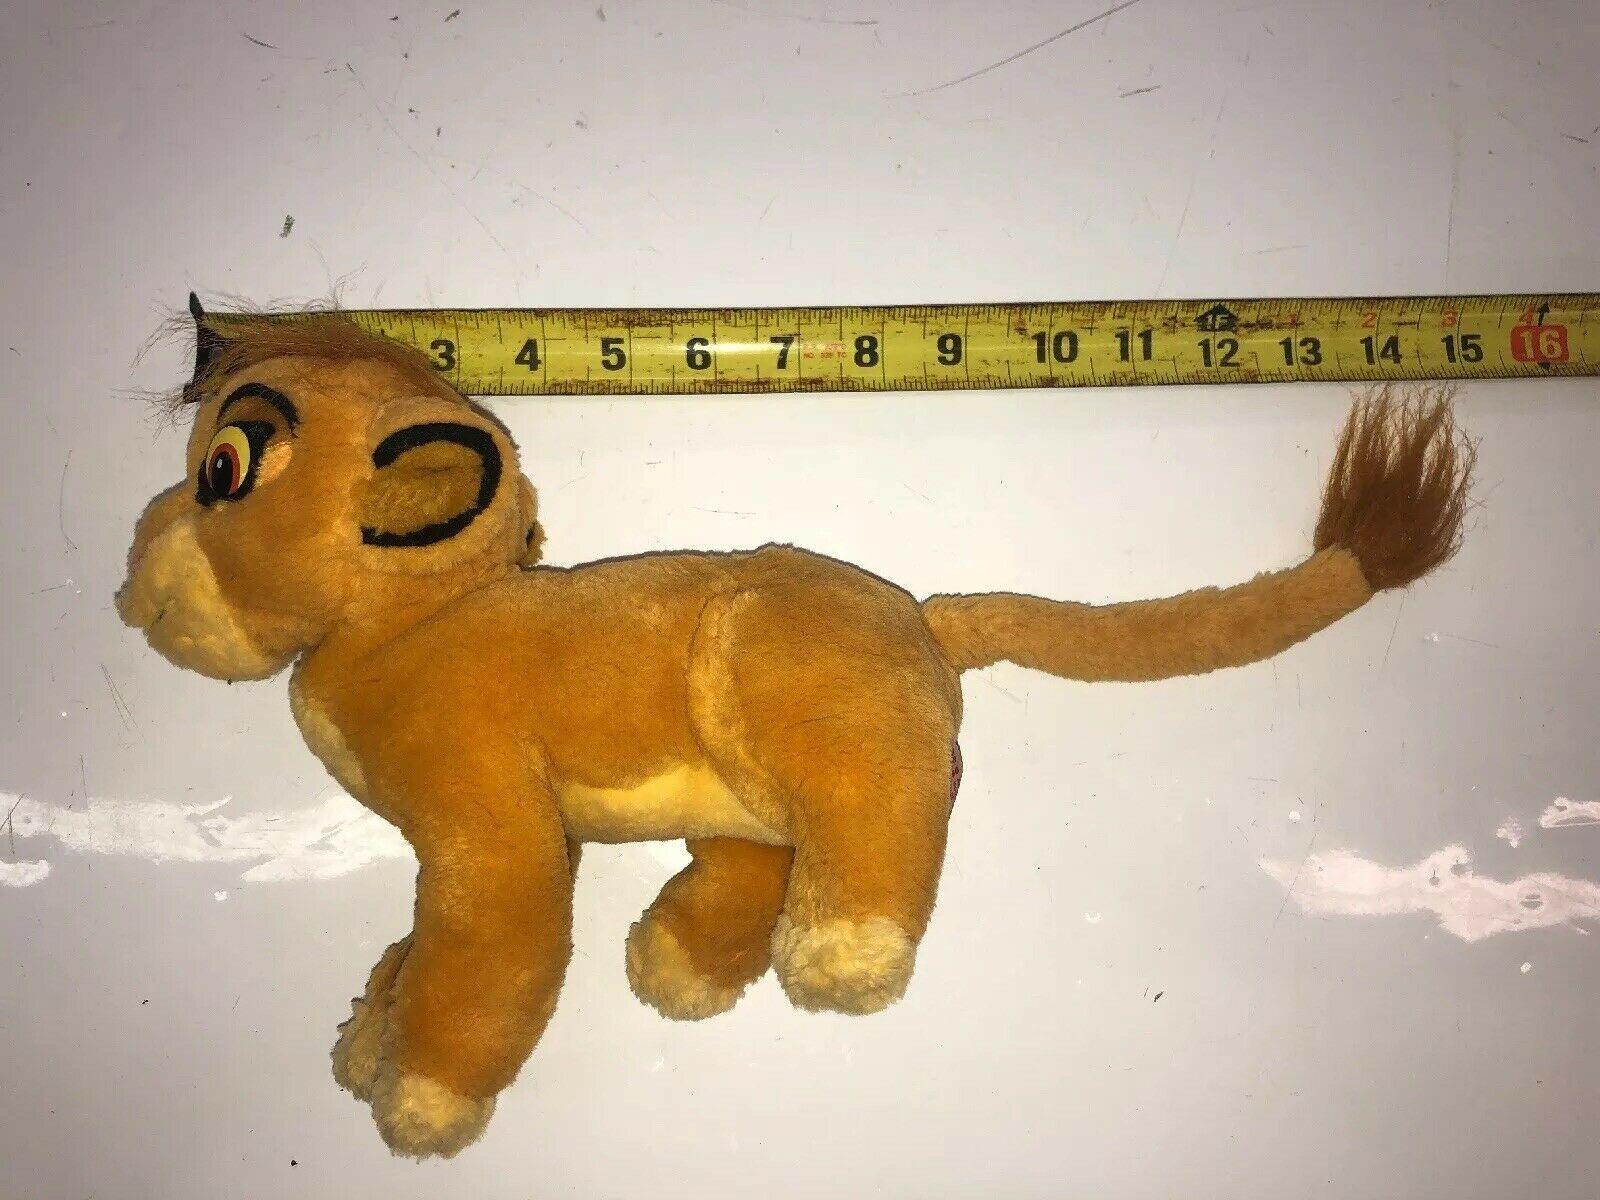 Applause Lion King Simba Cub Plush Disney Stuffed Animal beanbag Item 41716